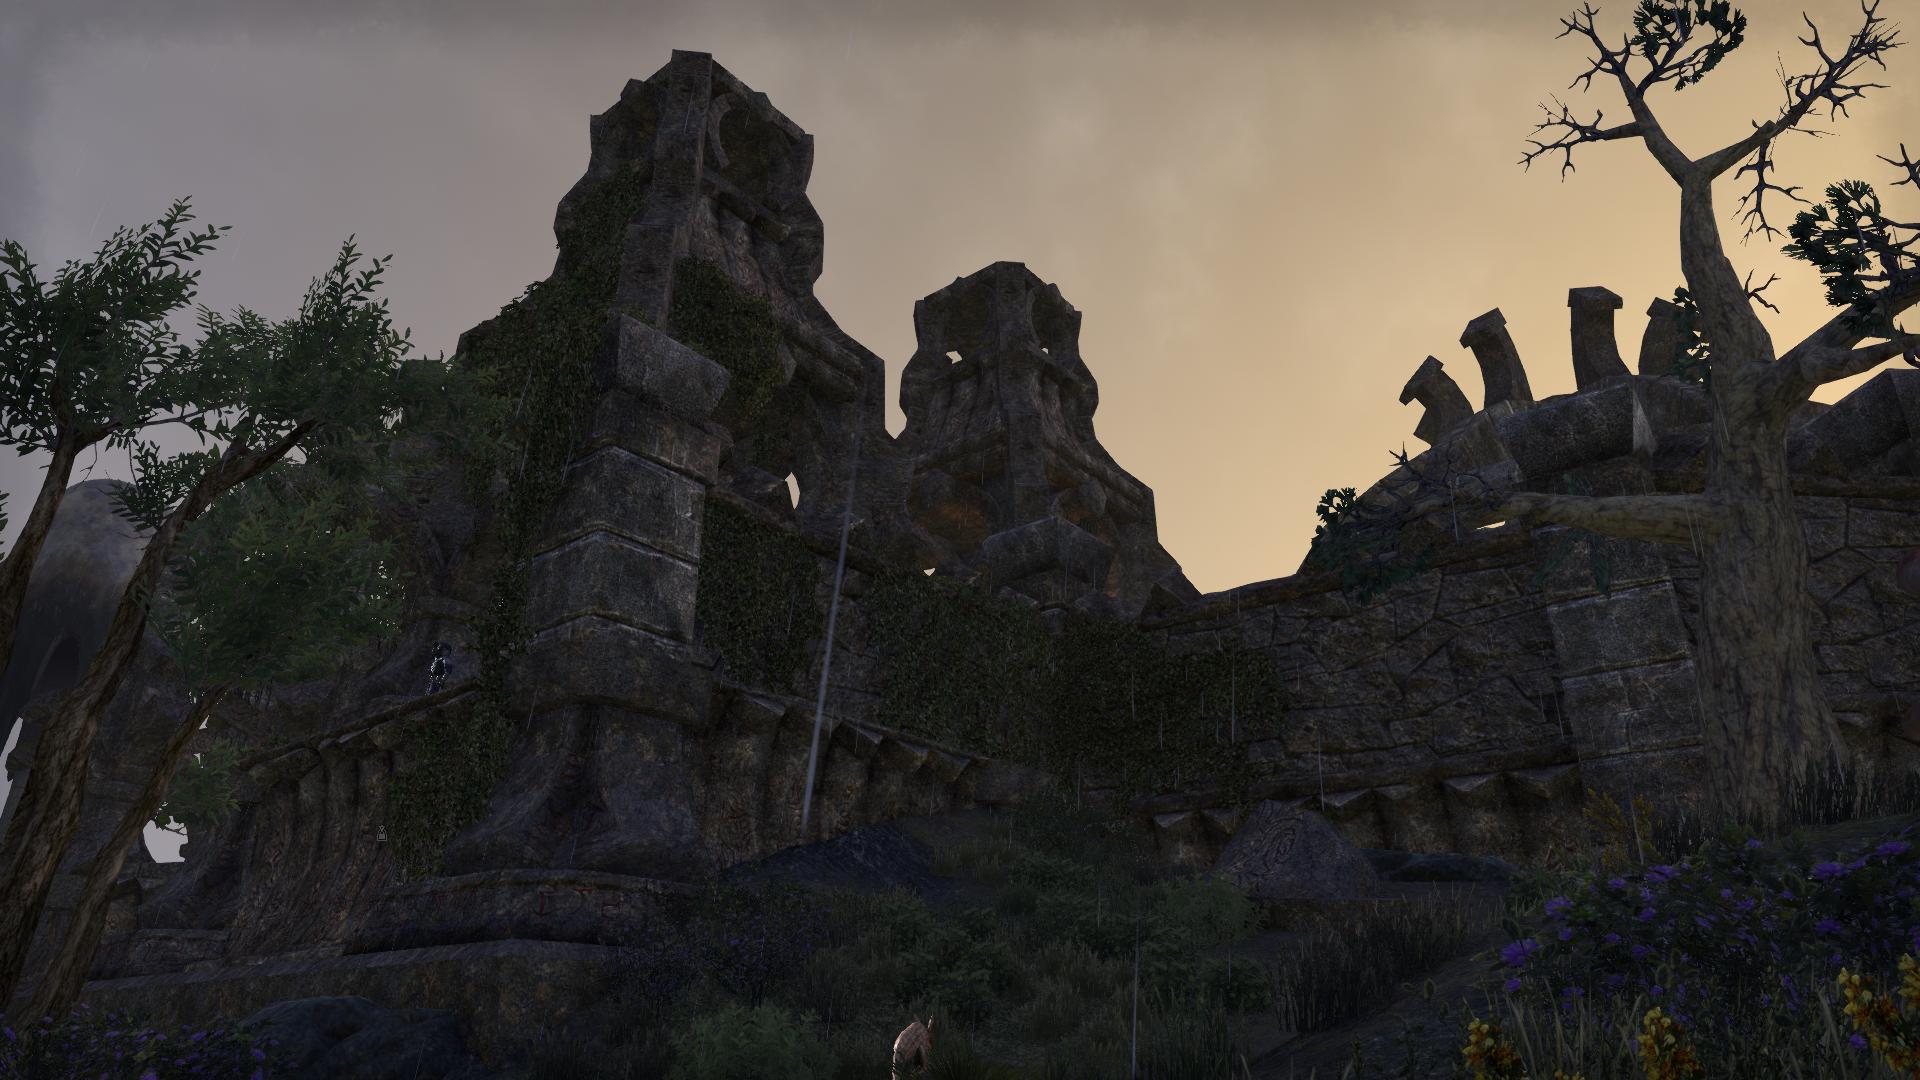 Ашалмавия (Online: Morrowind)